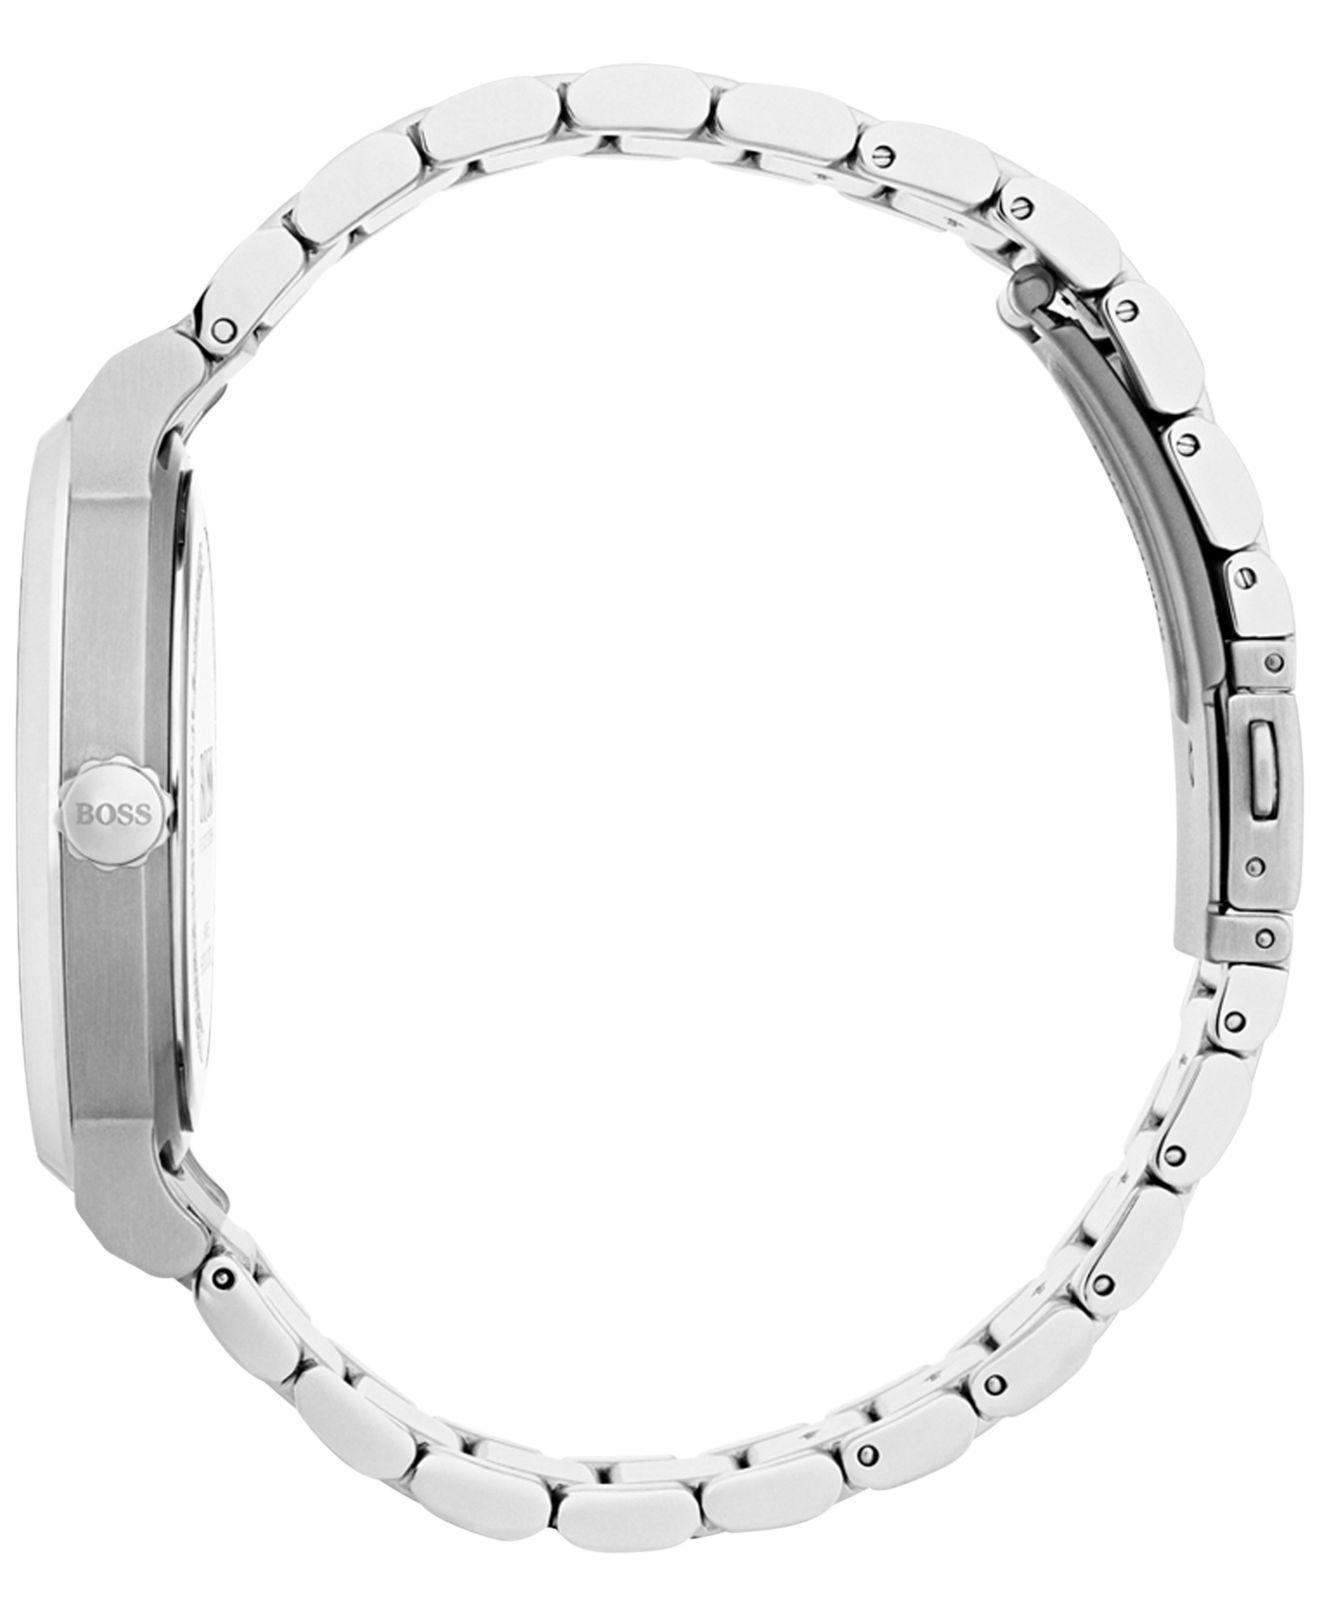 fb9c5e138b1 Lyst - BOSS Men s Essence Black Stainless Steel Bracelet Watch 42mm 1513501  in Metallic for Men